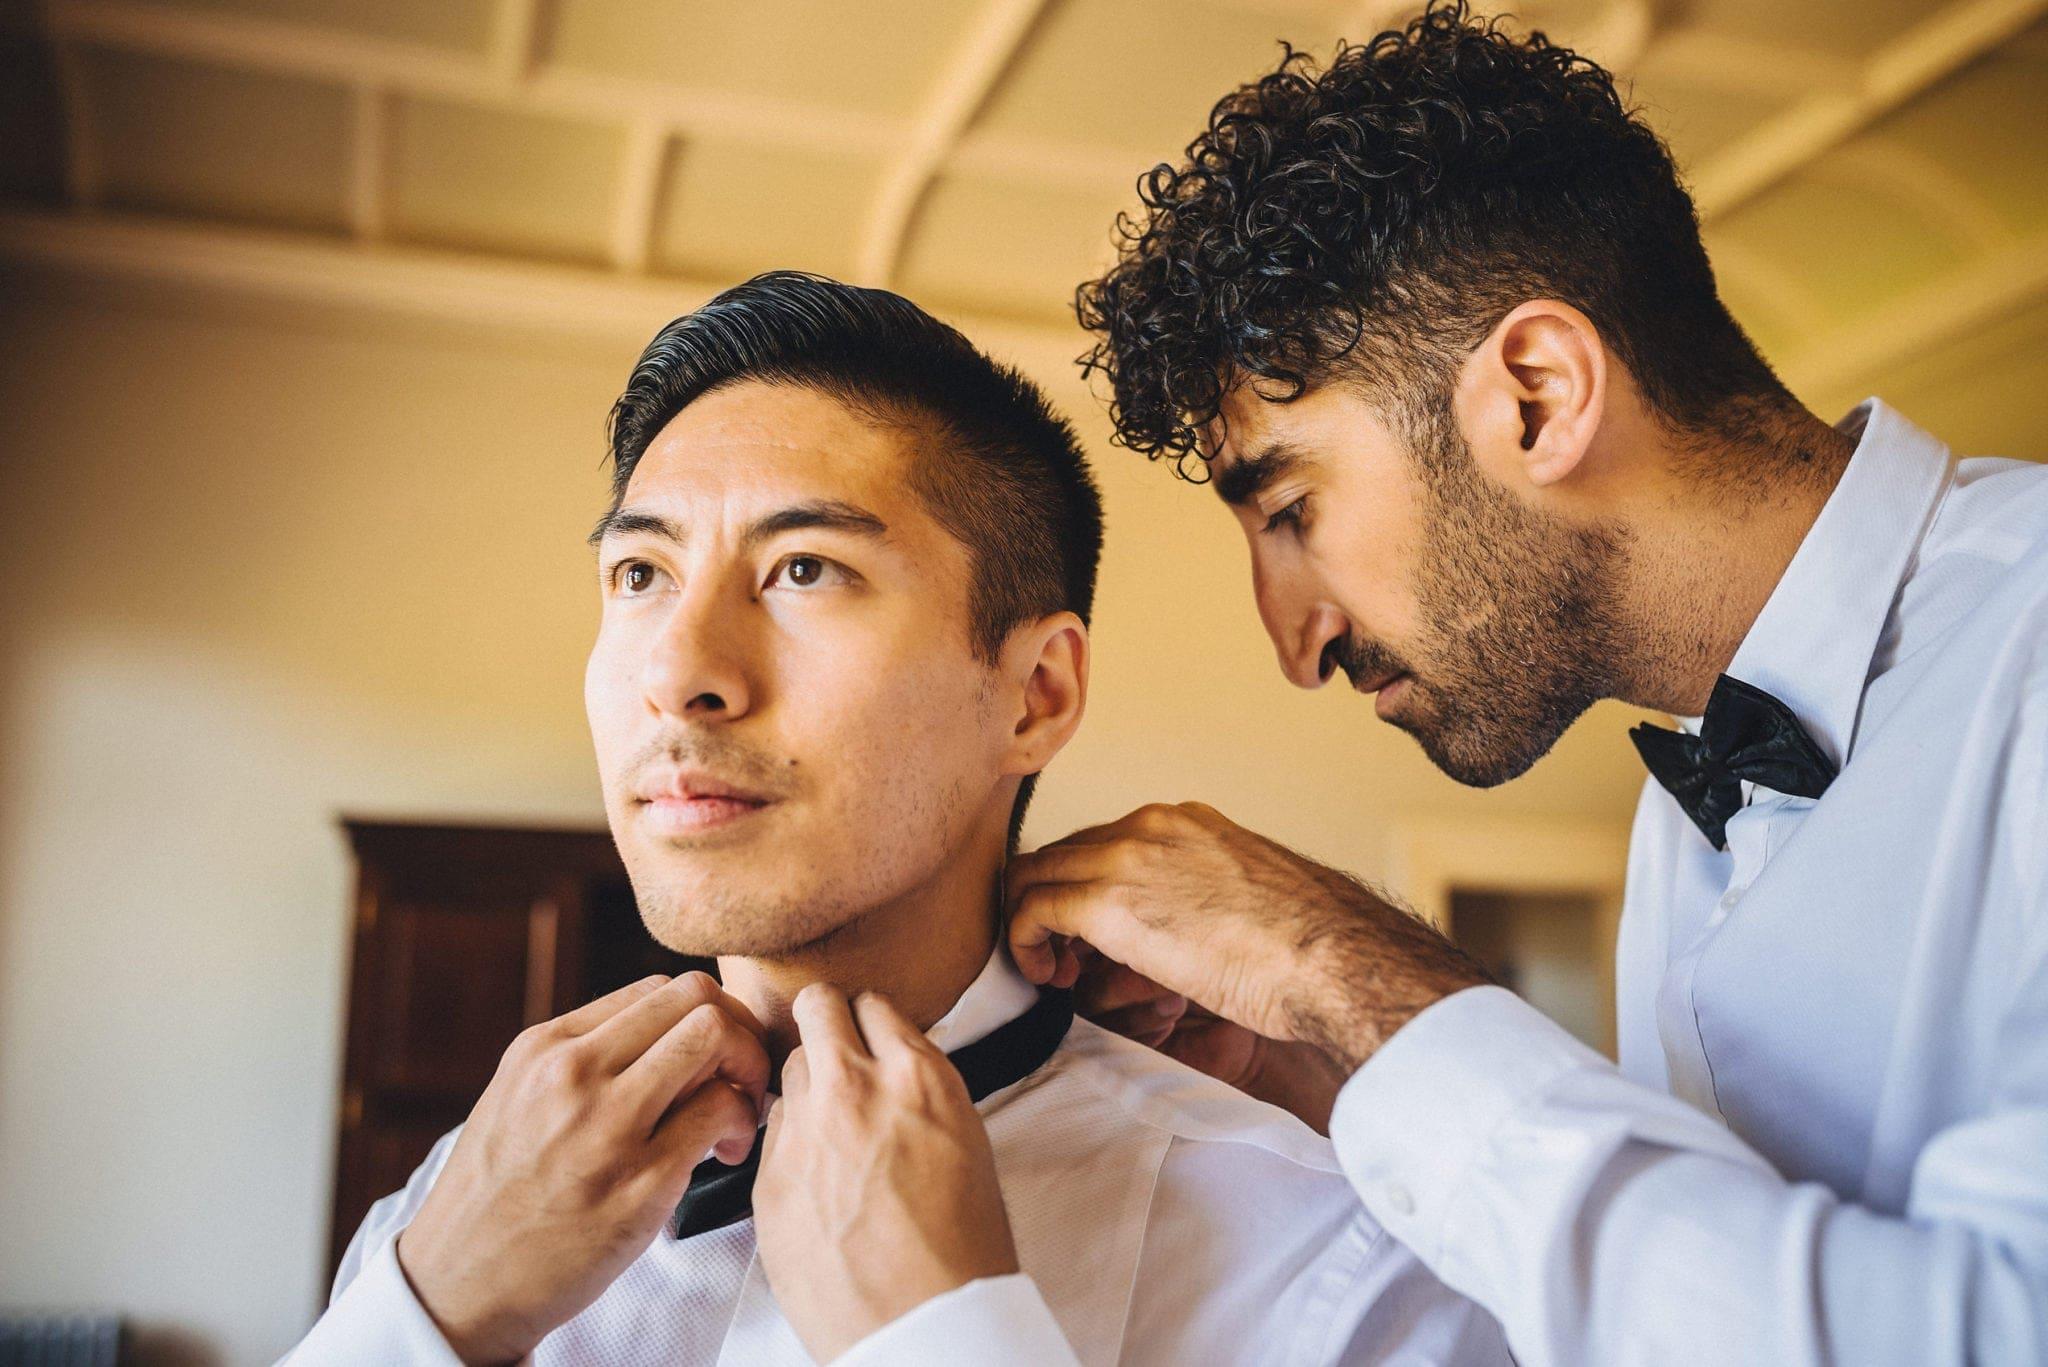 Groomsman fastens groom's bowtie